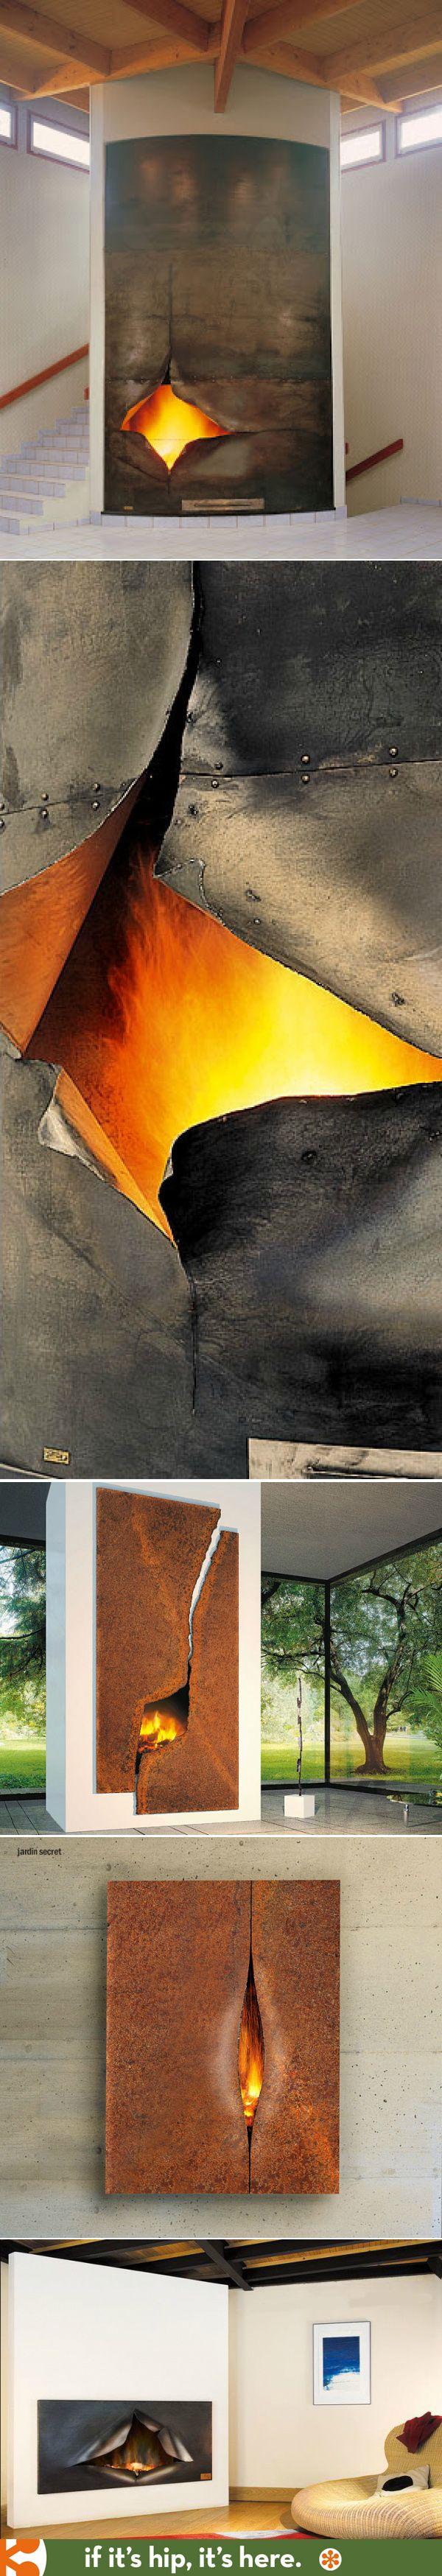 Sculptural 'torn metal' fireplaces by Focus.